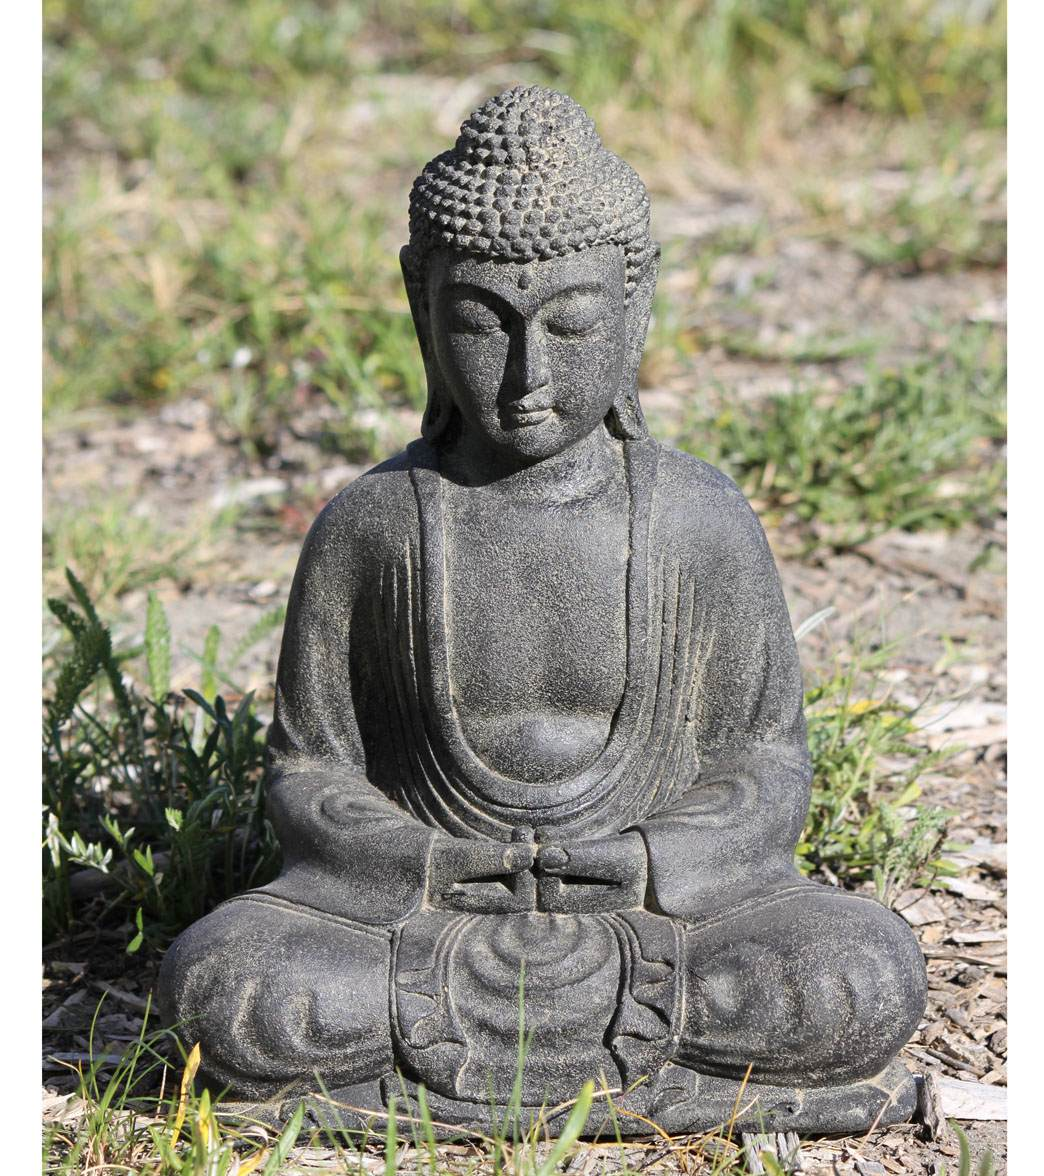 Lotus Sculpture Meditating Garden Buddha Statue 12 At Swimoutlet Com Free Shipping